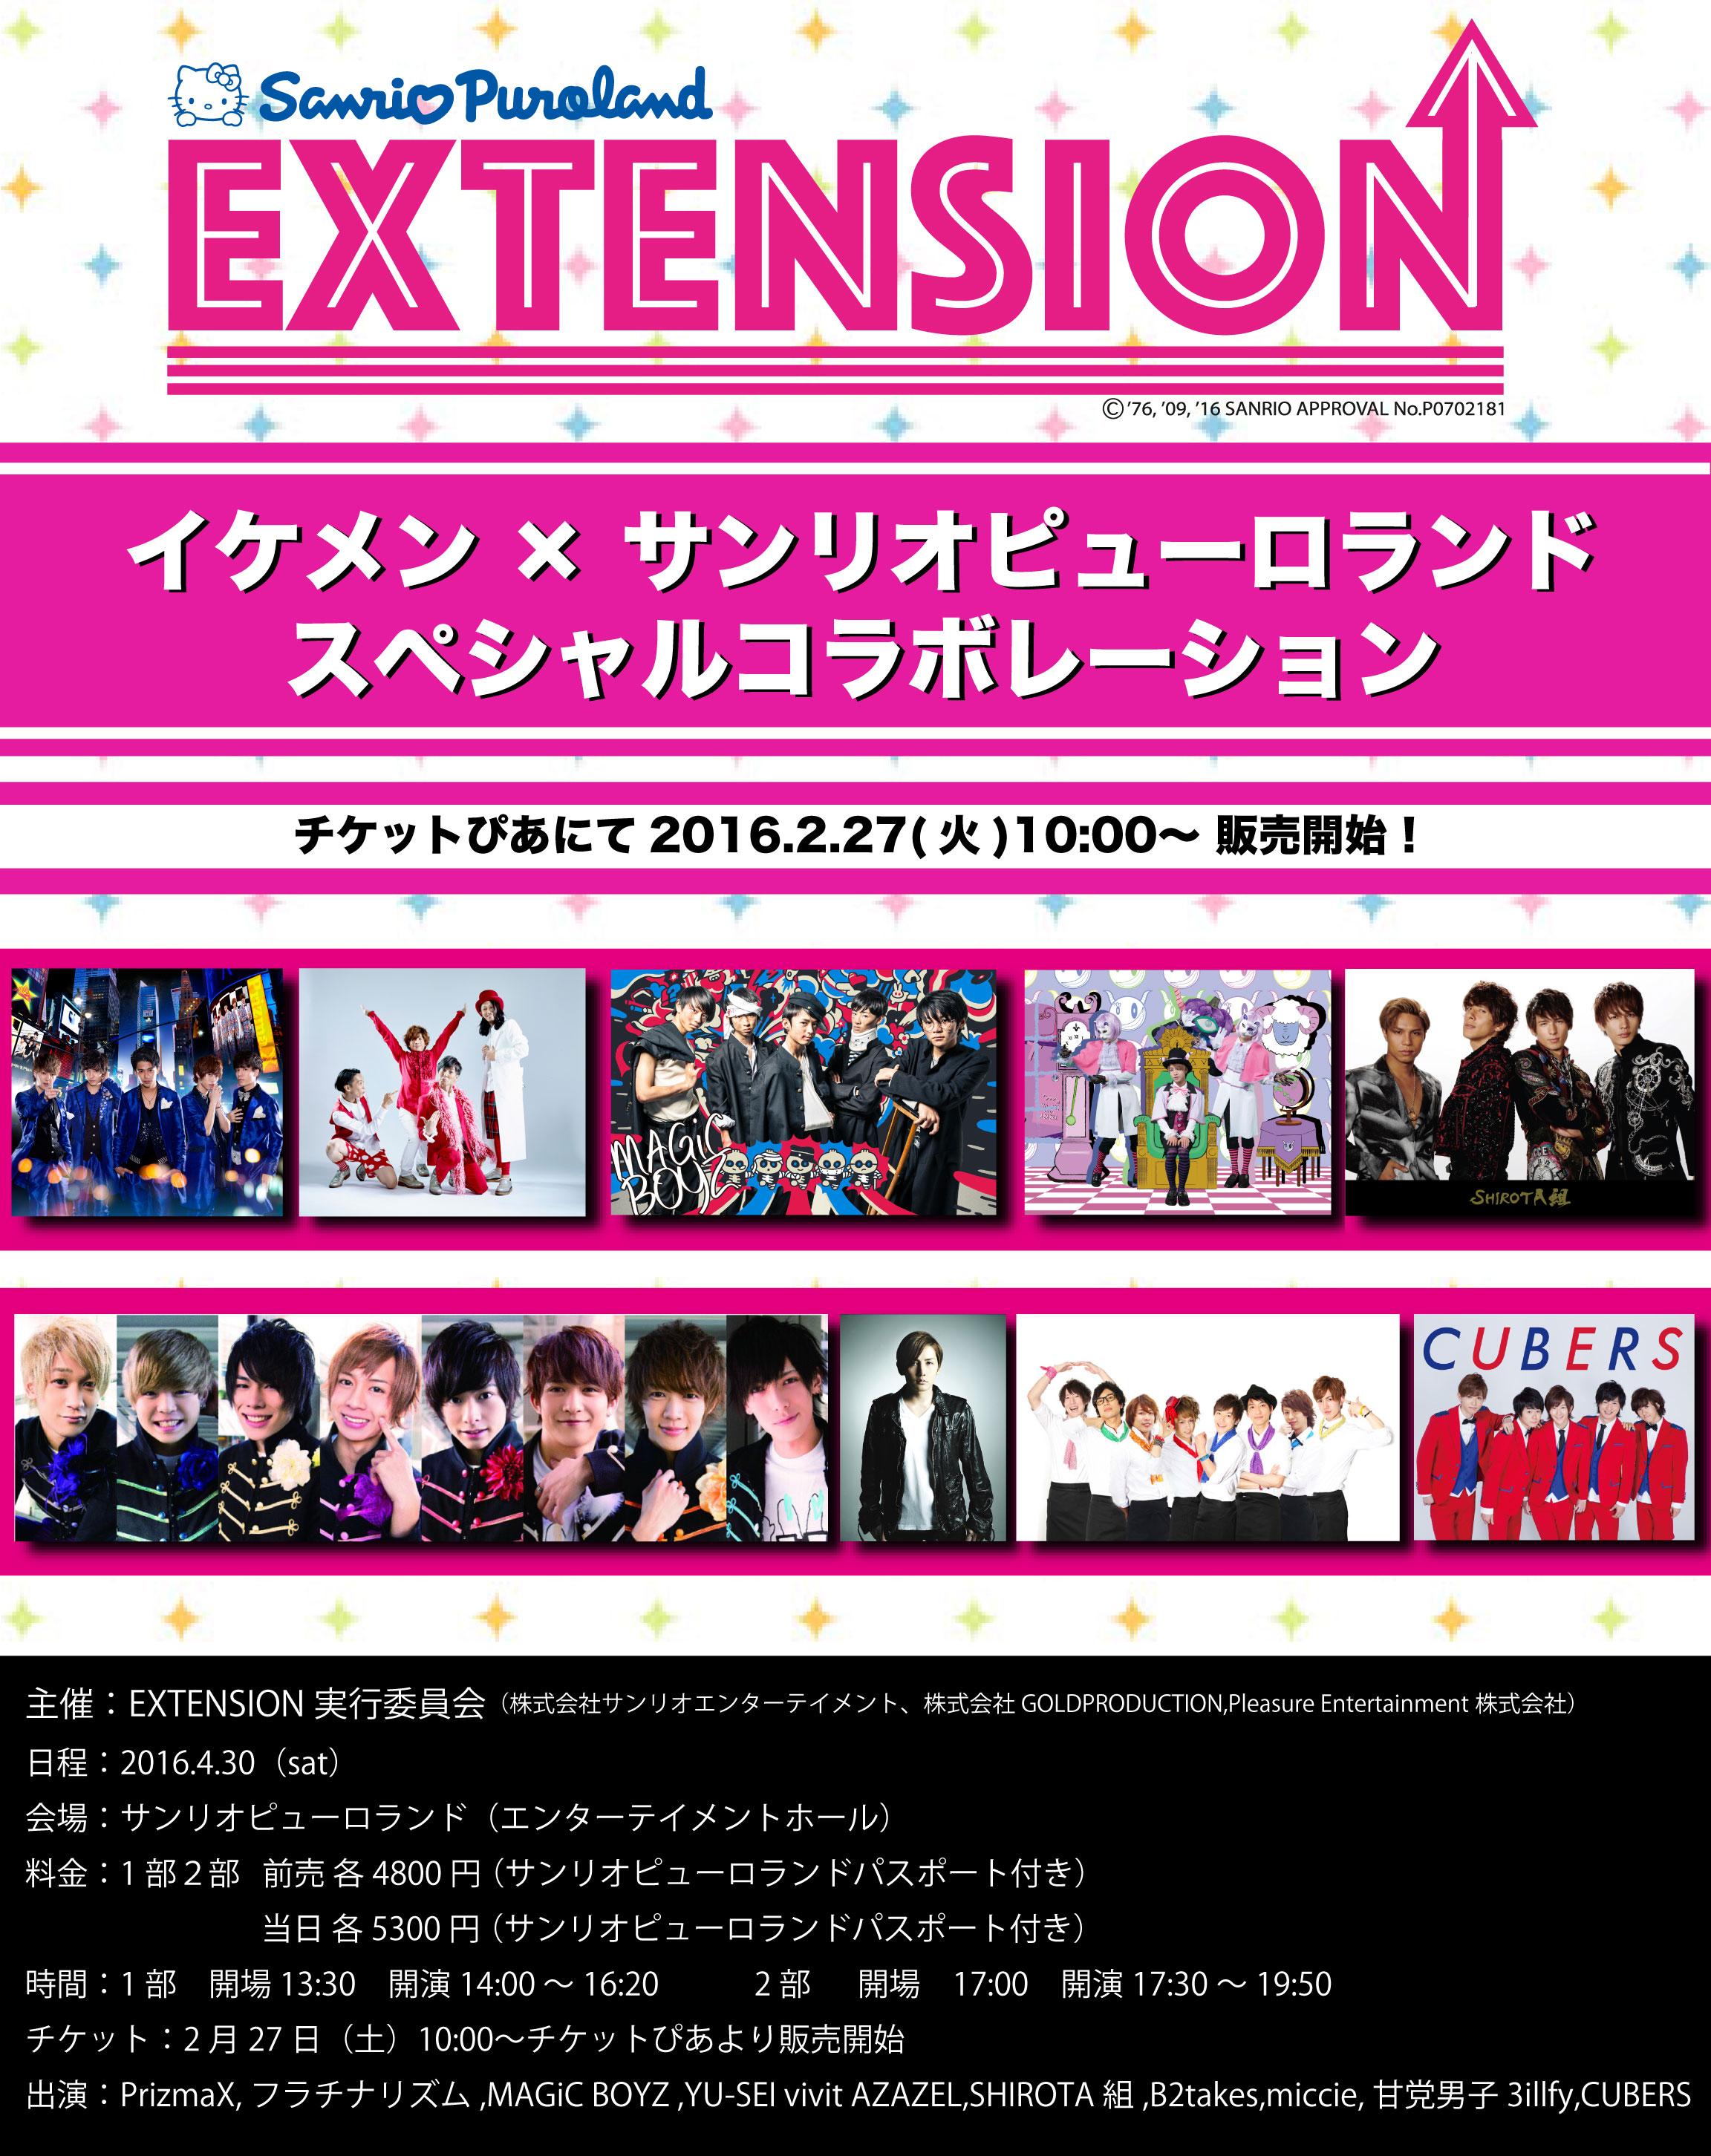 4月30日(土) 「EXTENSION vol.1」CUBERS出演決定!